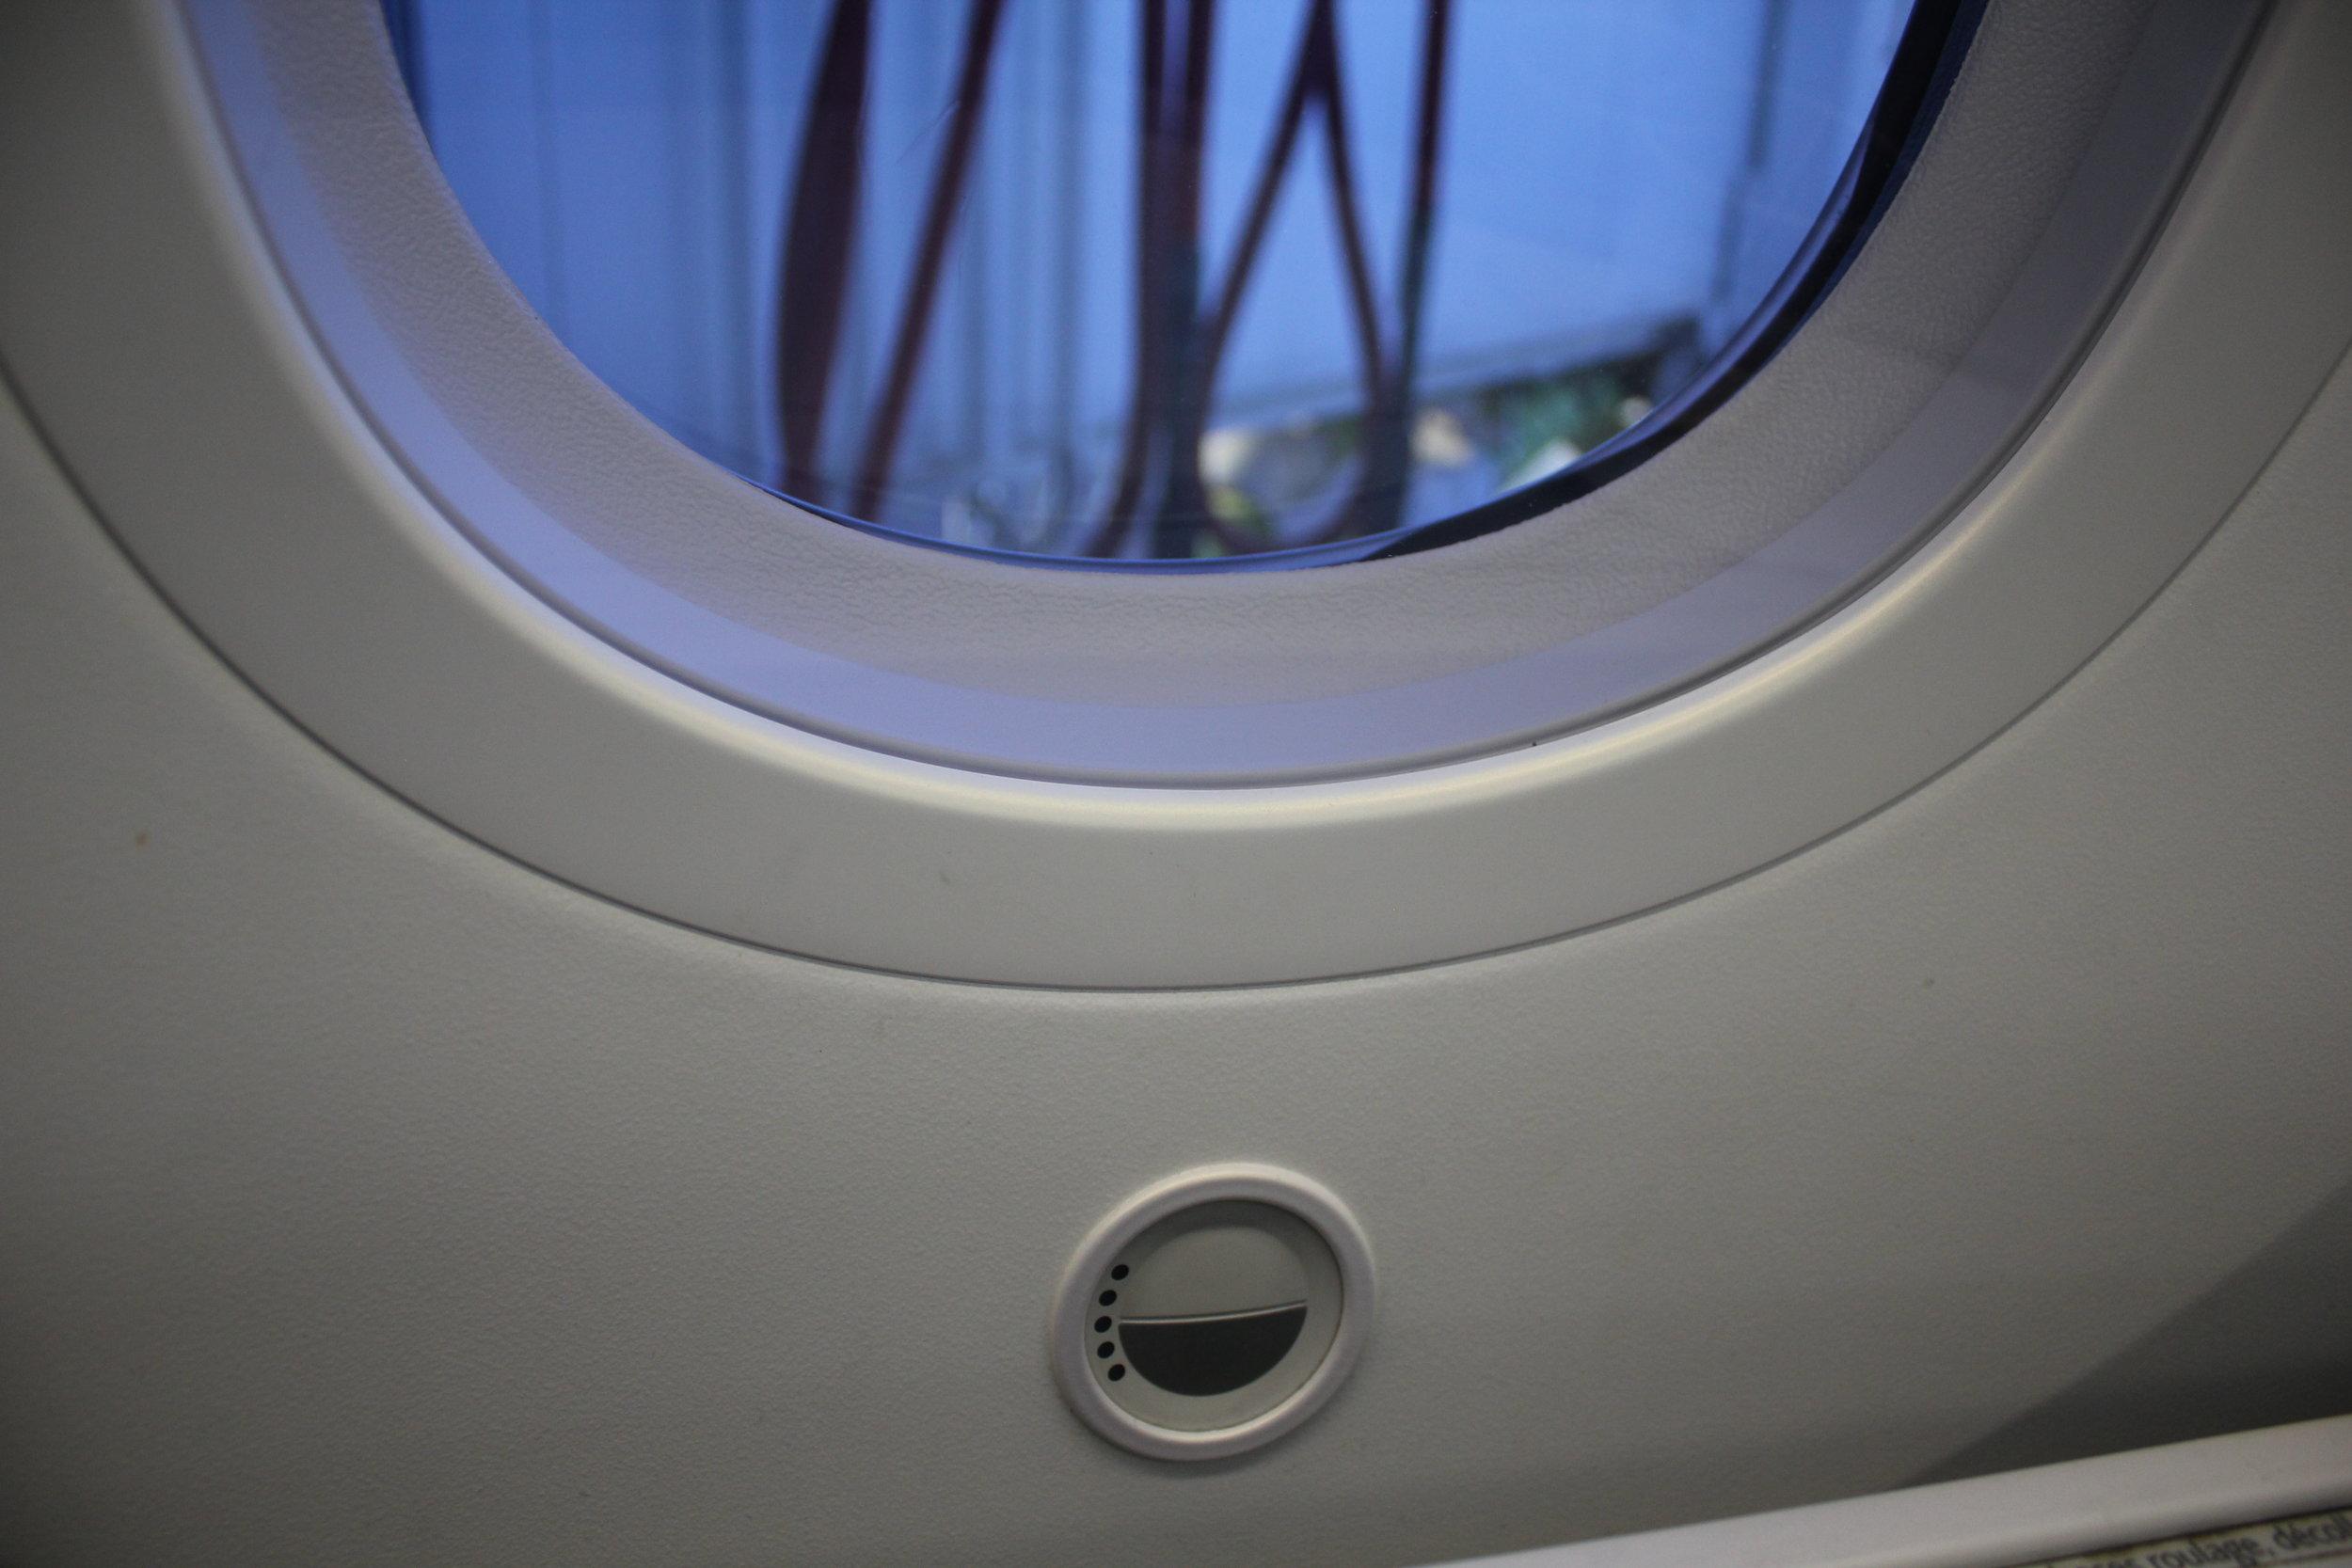 Air Canada business class – Window switch